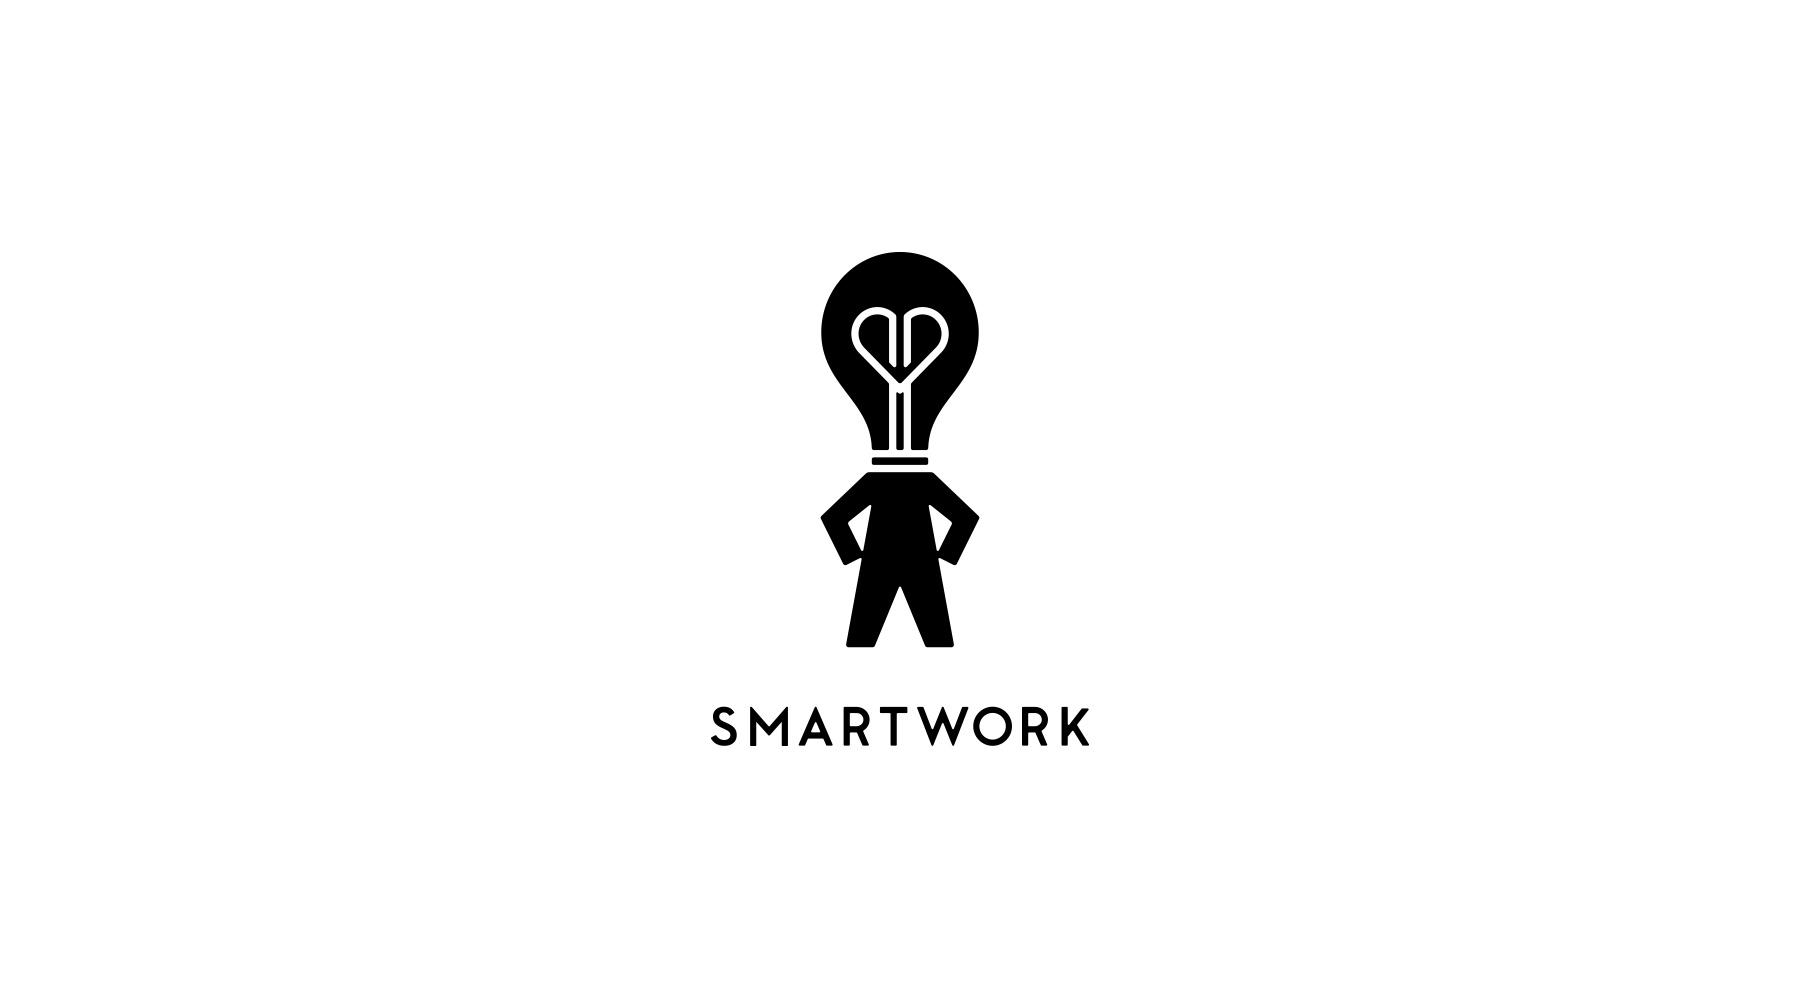 StudioDixon-Logo-Smartwork_BW